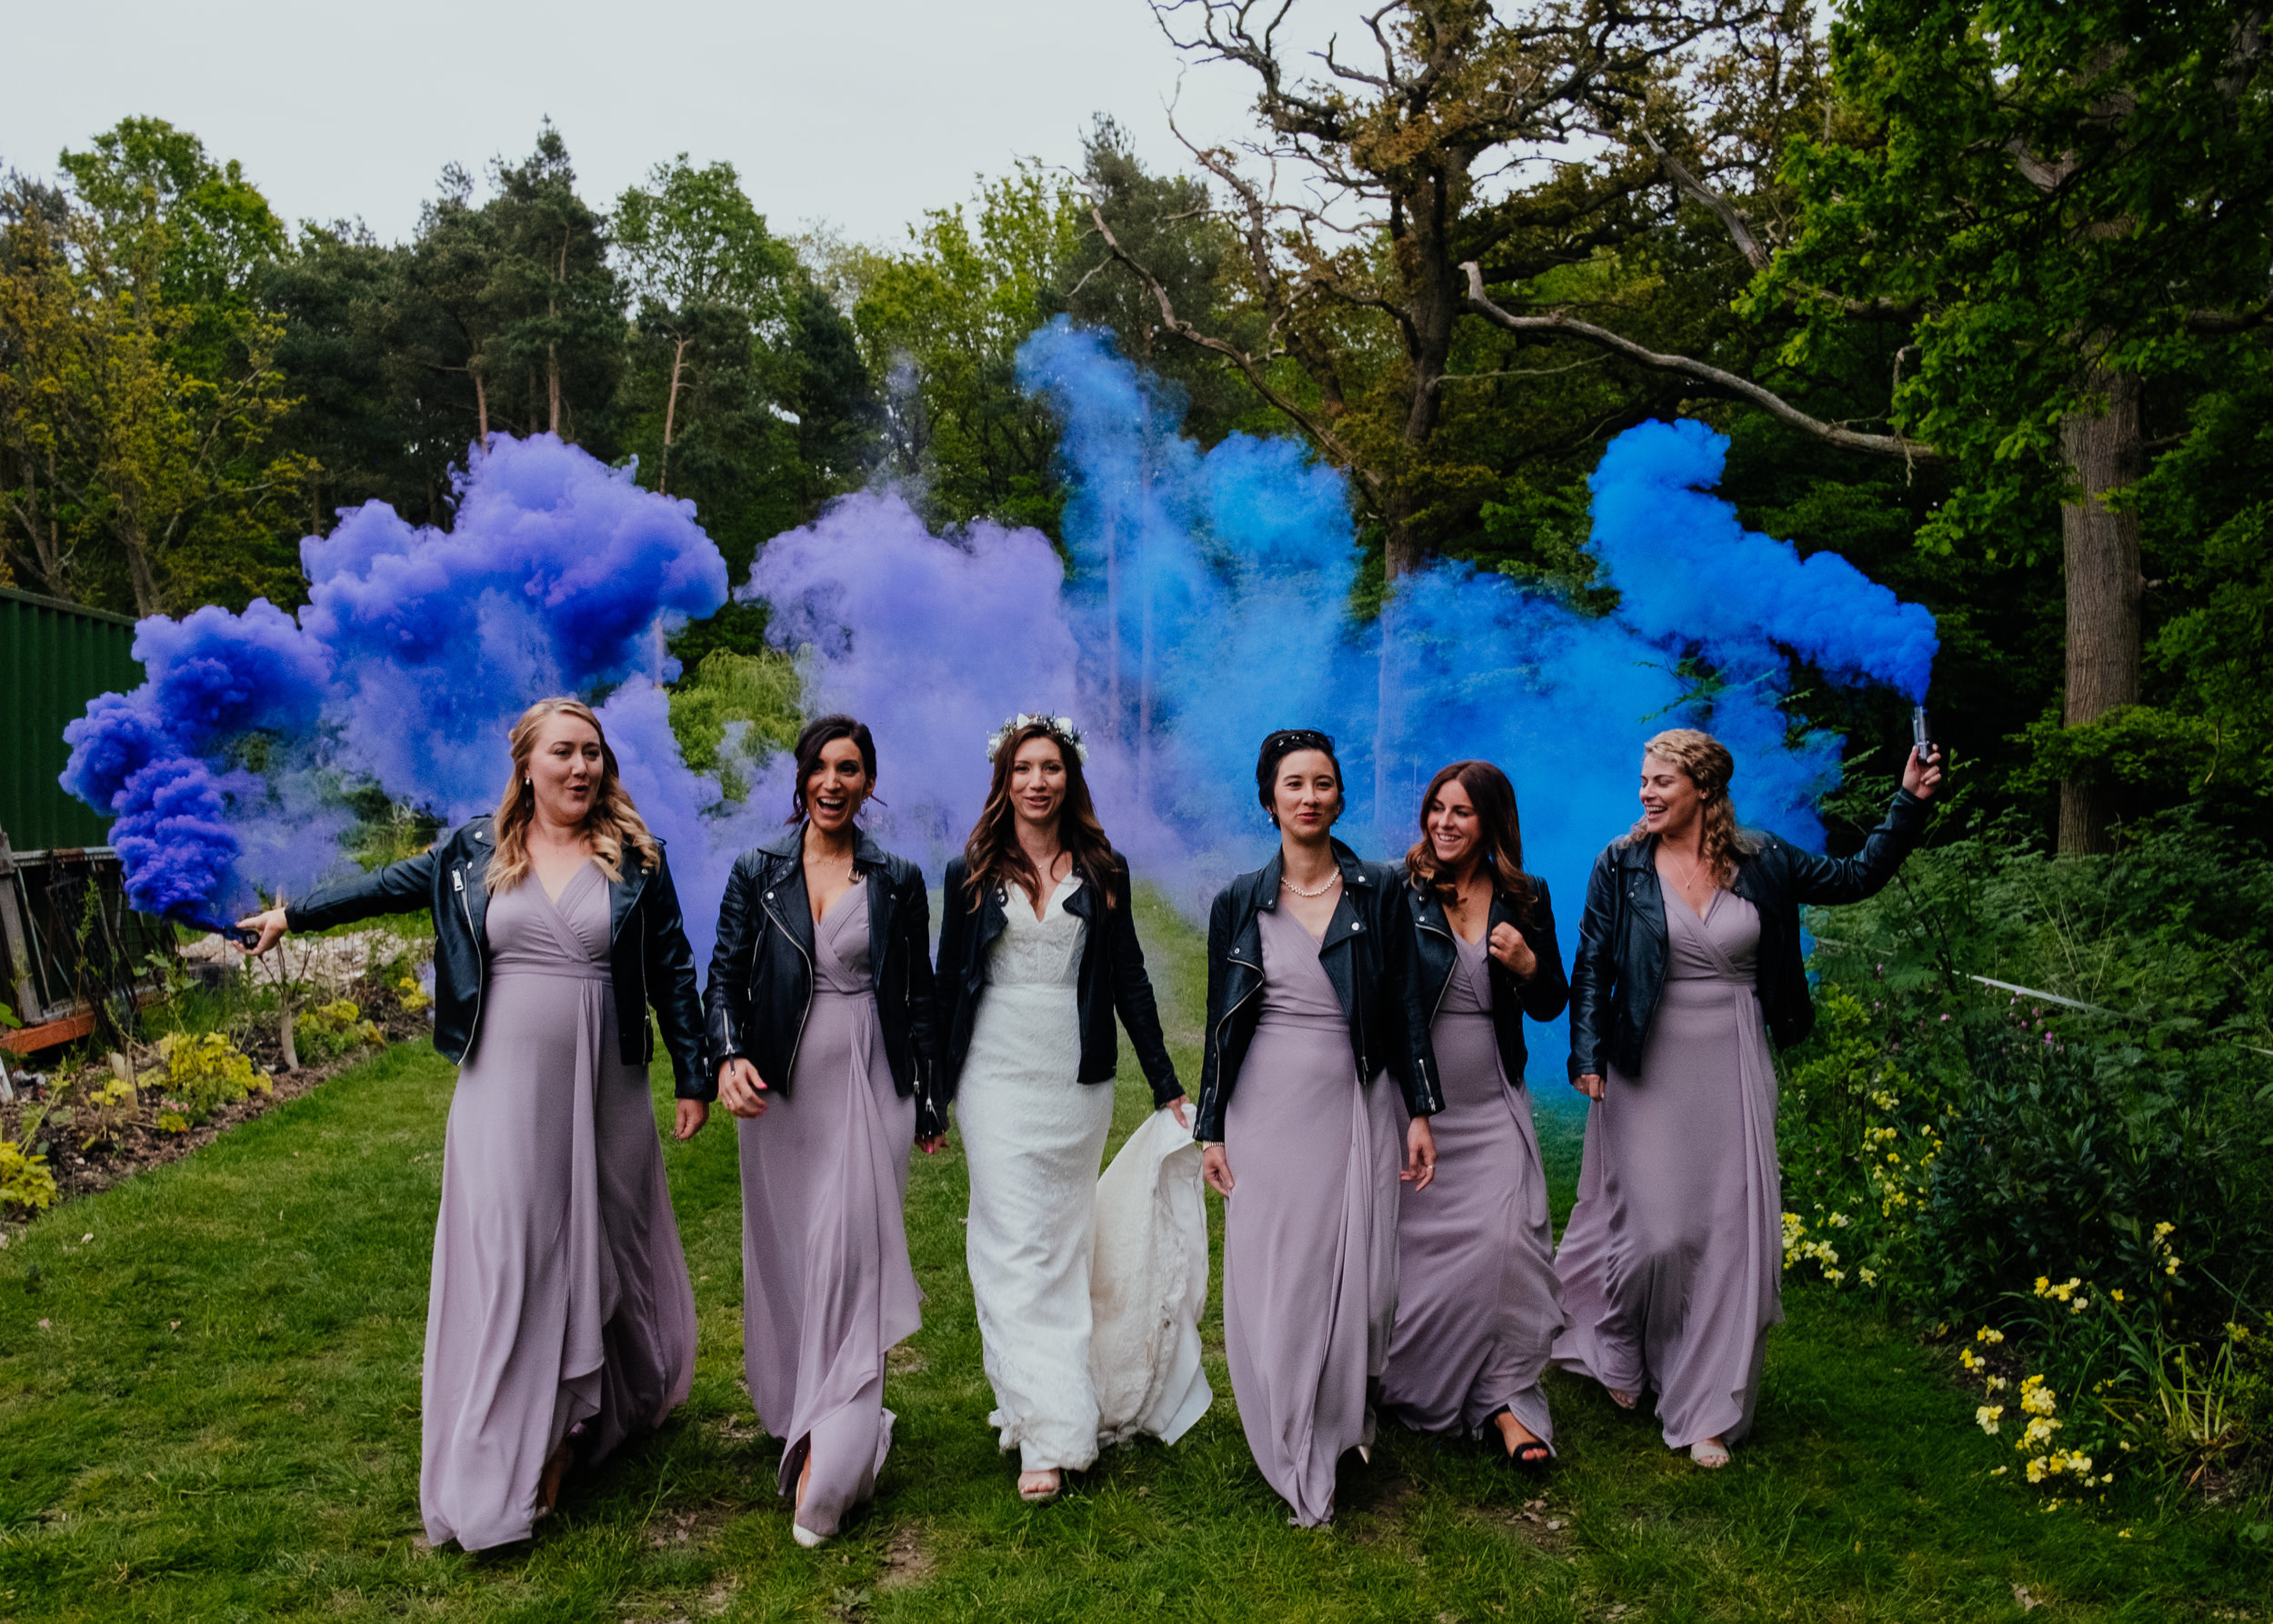 Badass bridesmaids walking along with the bride holding coloured smoke grenades